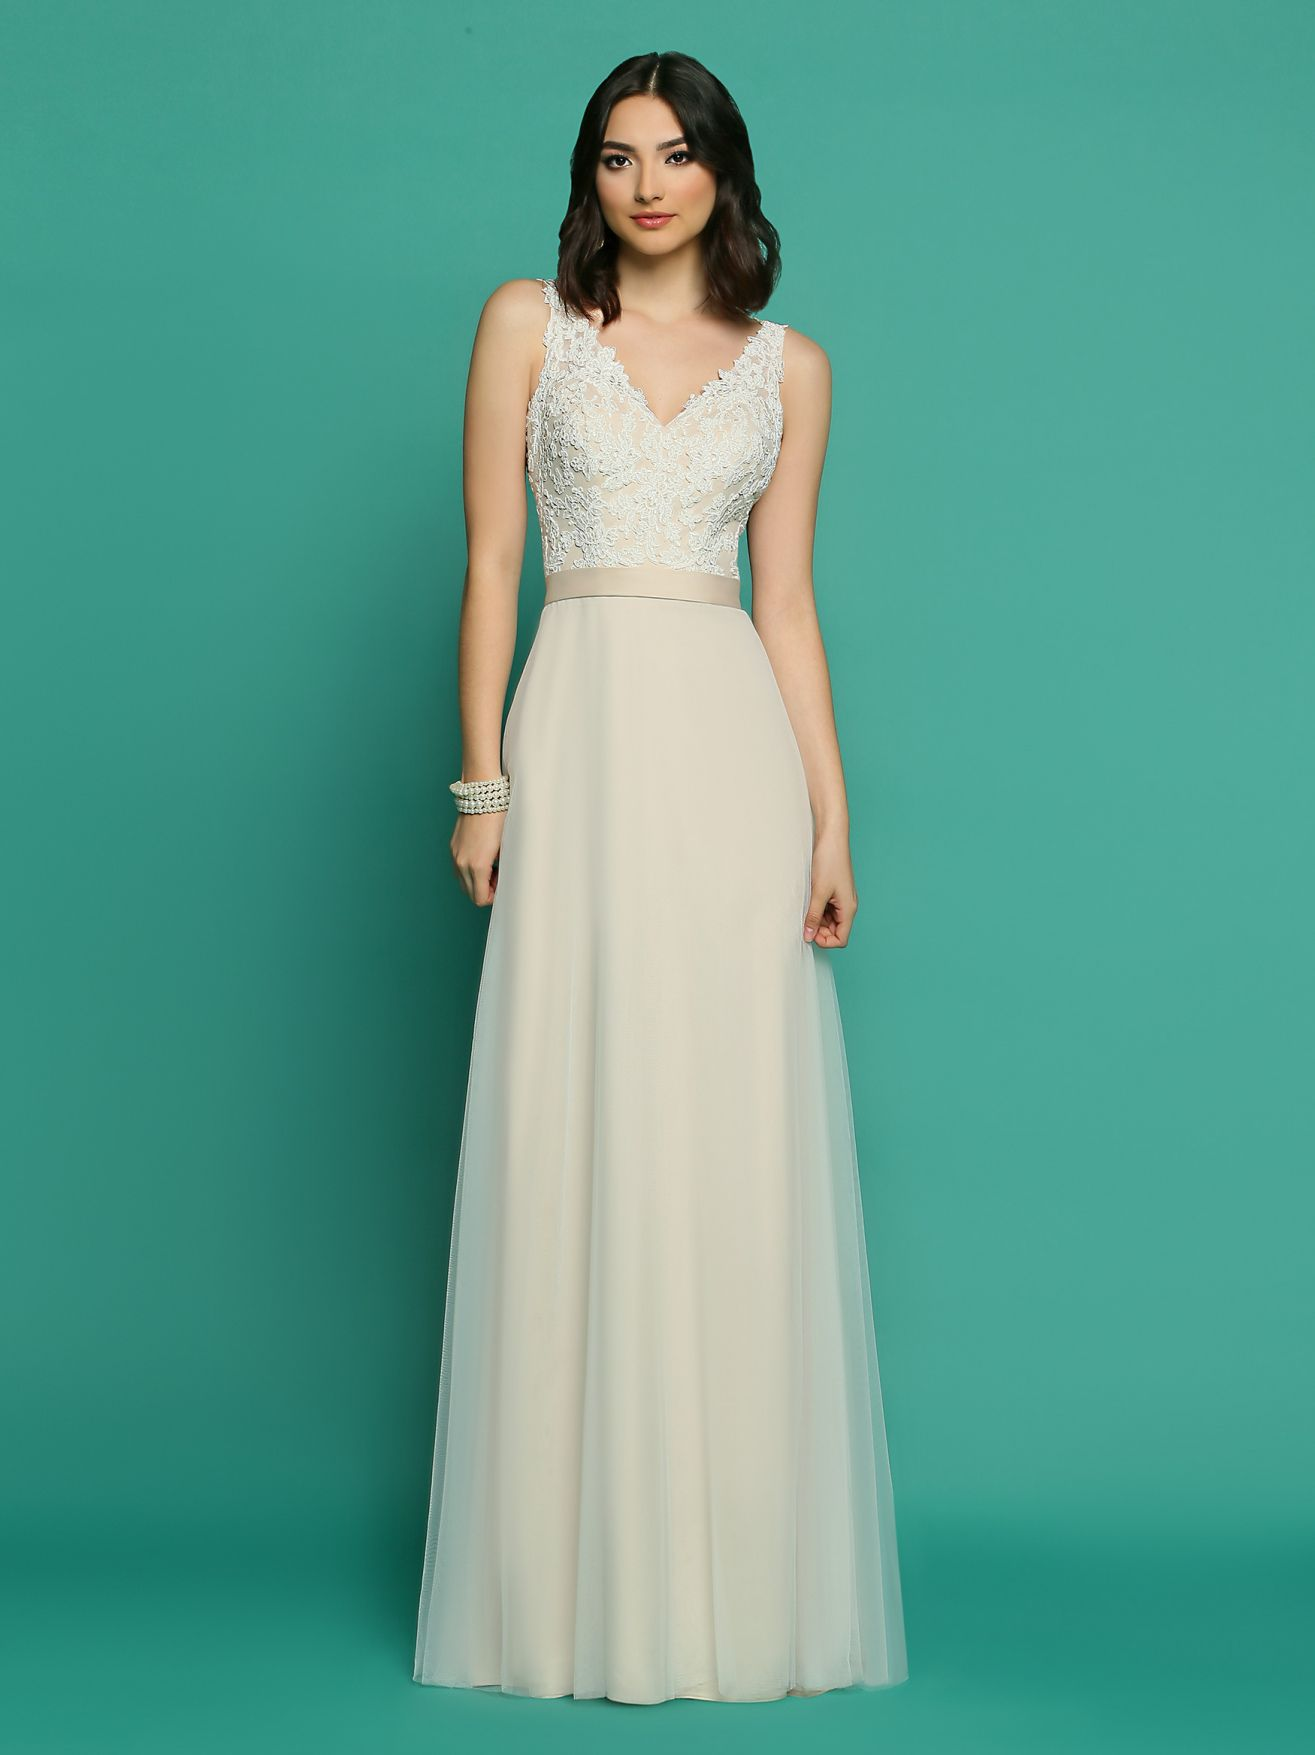 55+ Simple Informal Wedding Dresses - Best Wedding Dress for Pear ...